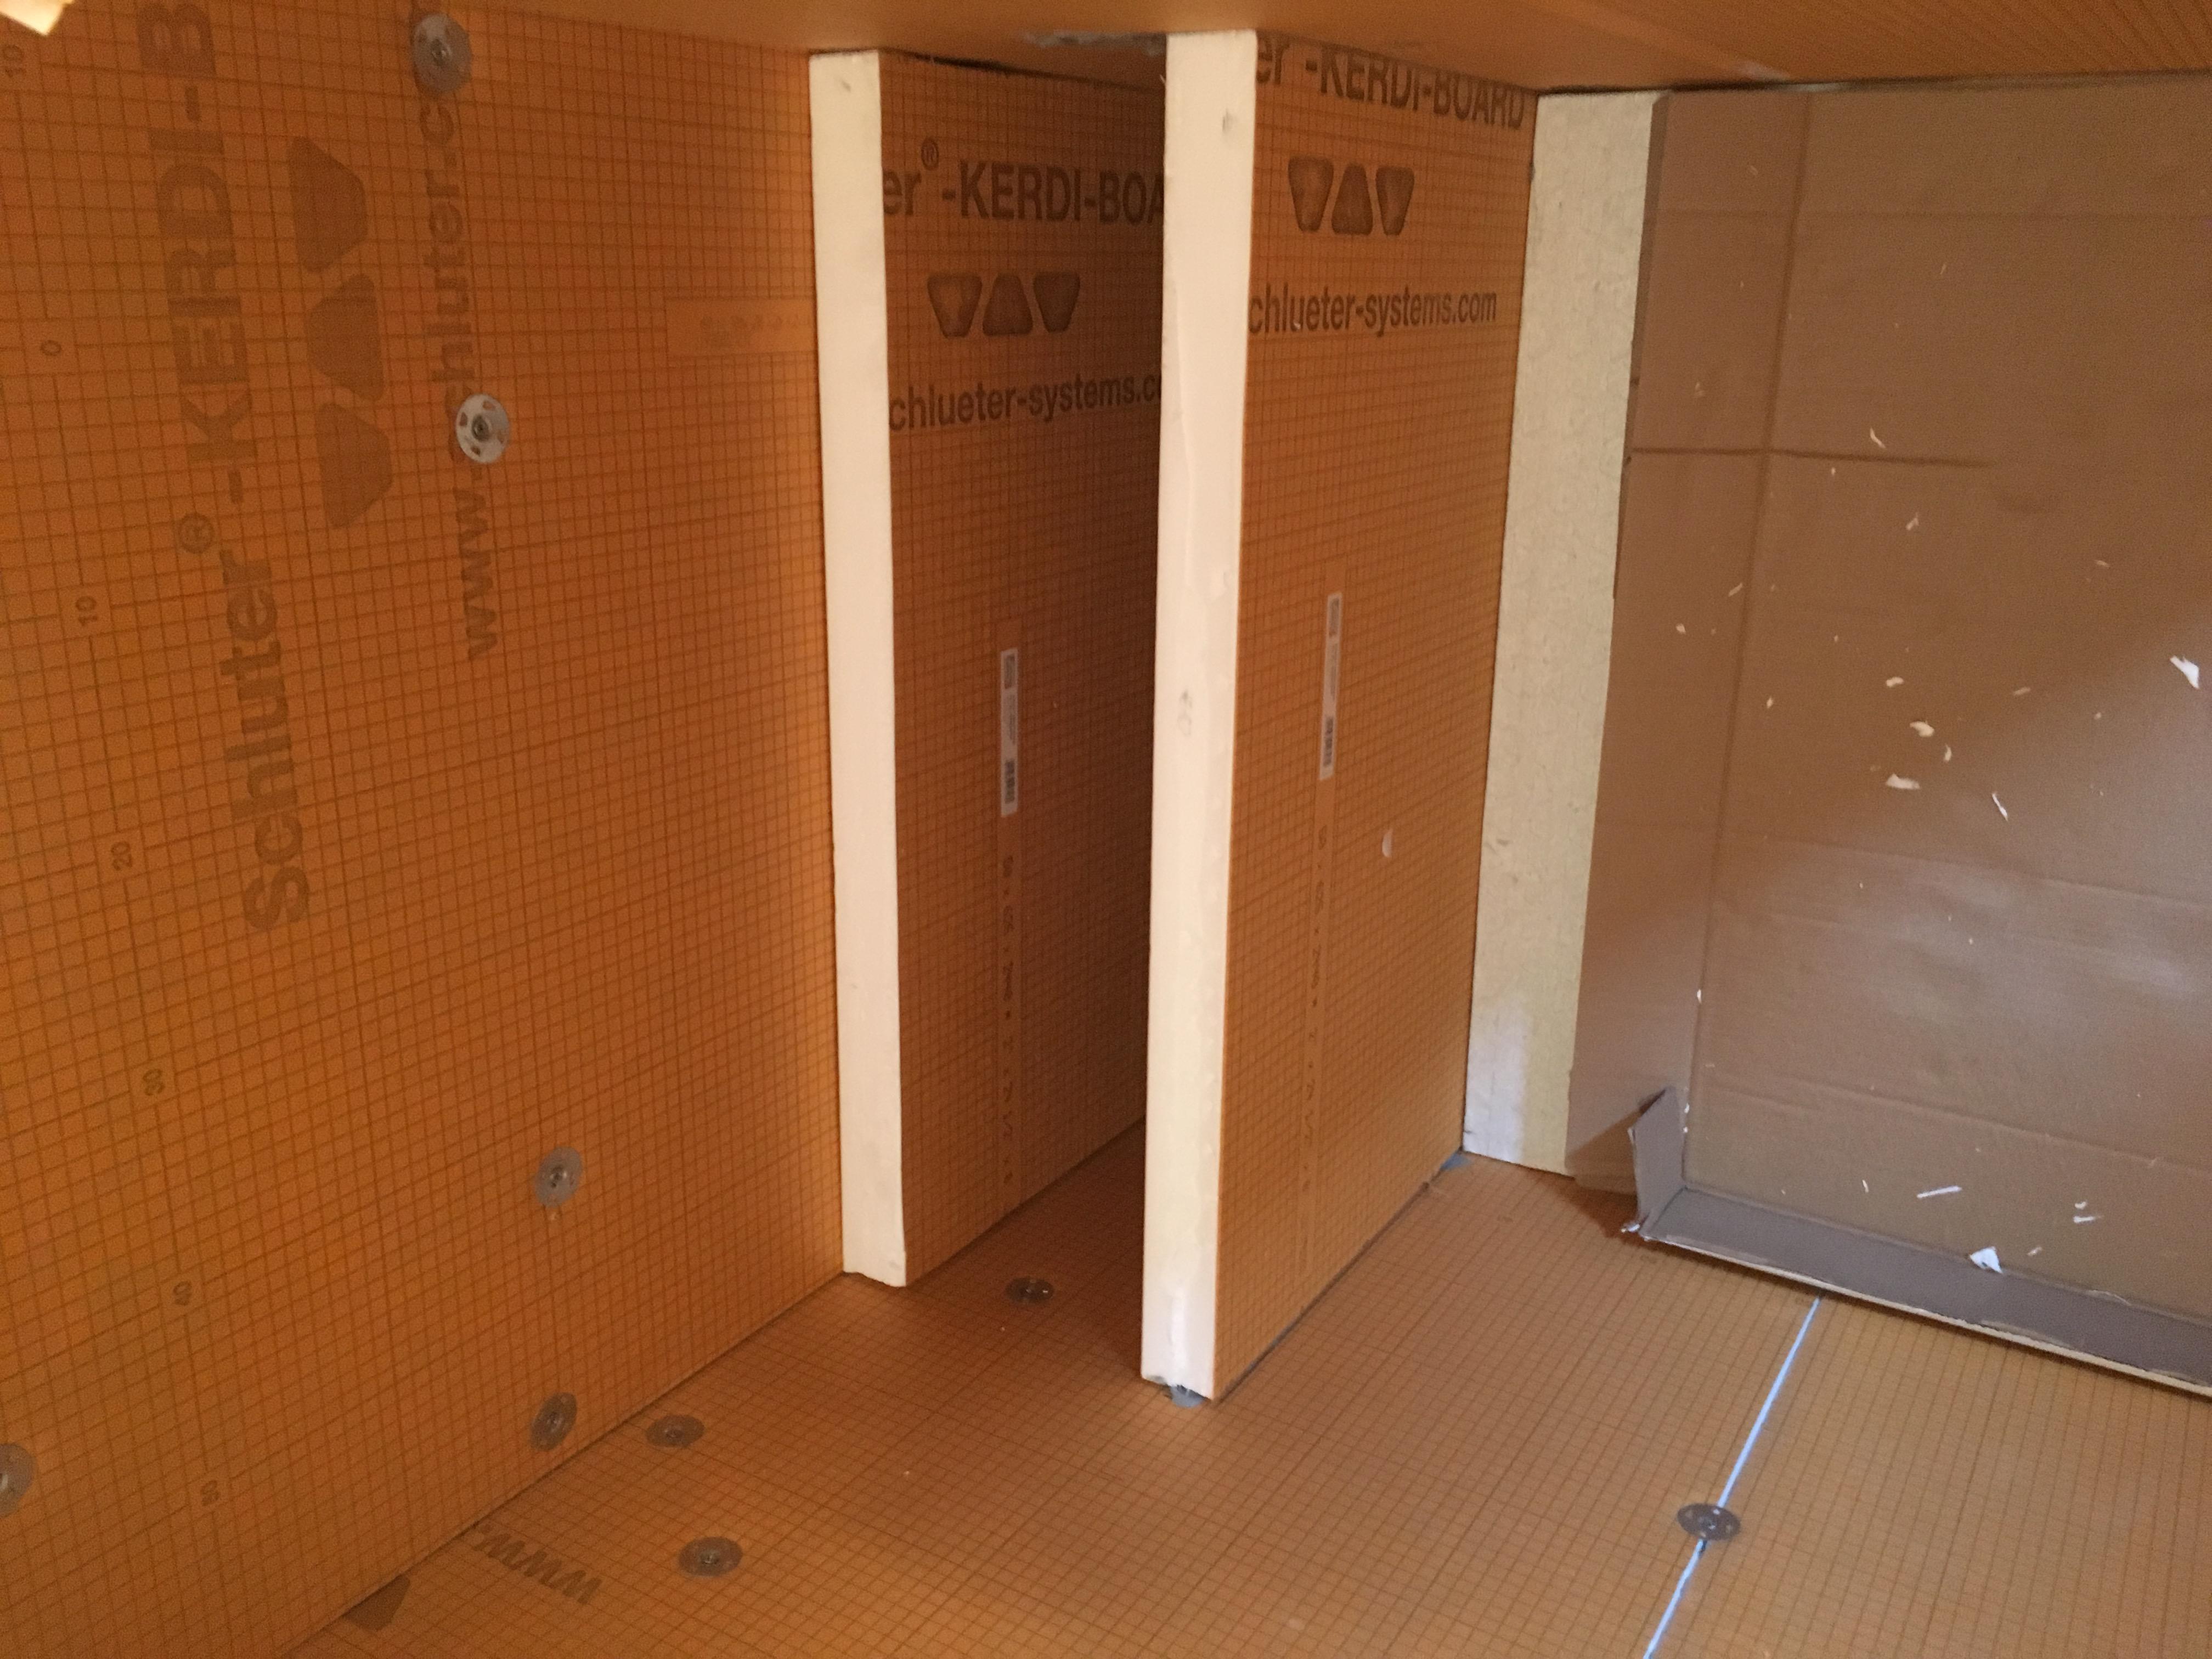 Cutting Kerdi Shower Pan-c31d482b-dbe6-43e3-ab17-40ba822fcd28.jpeg